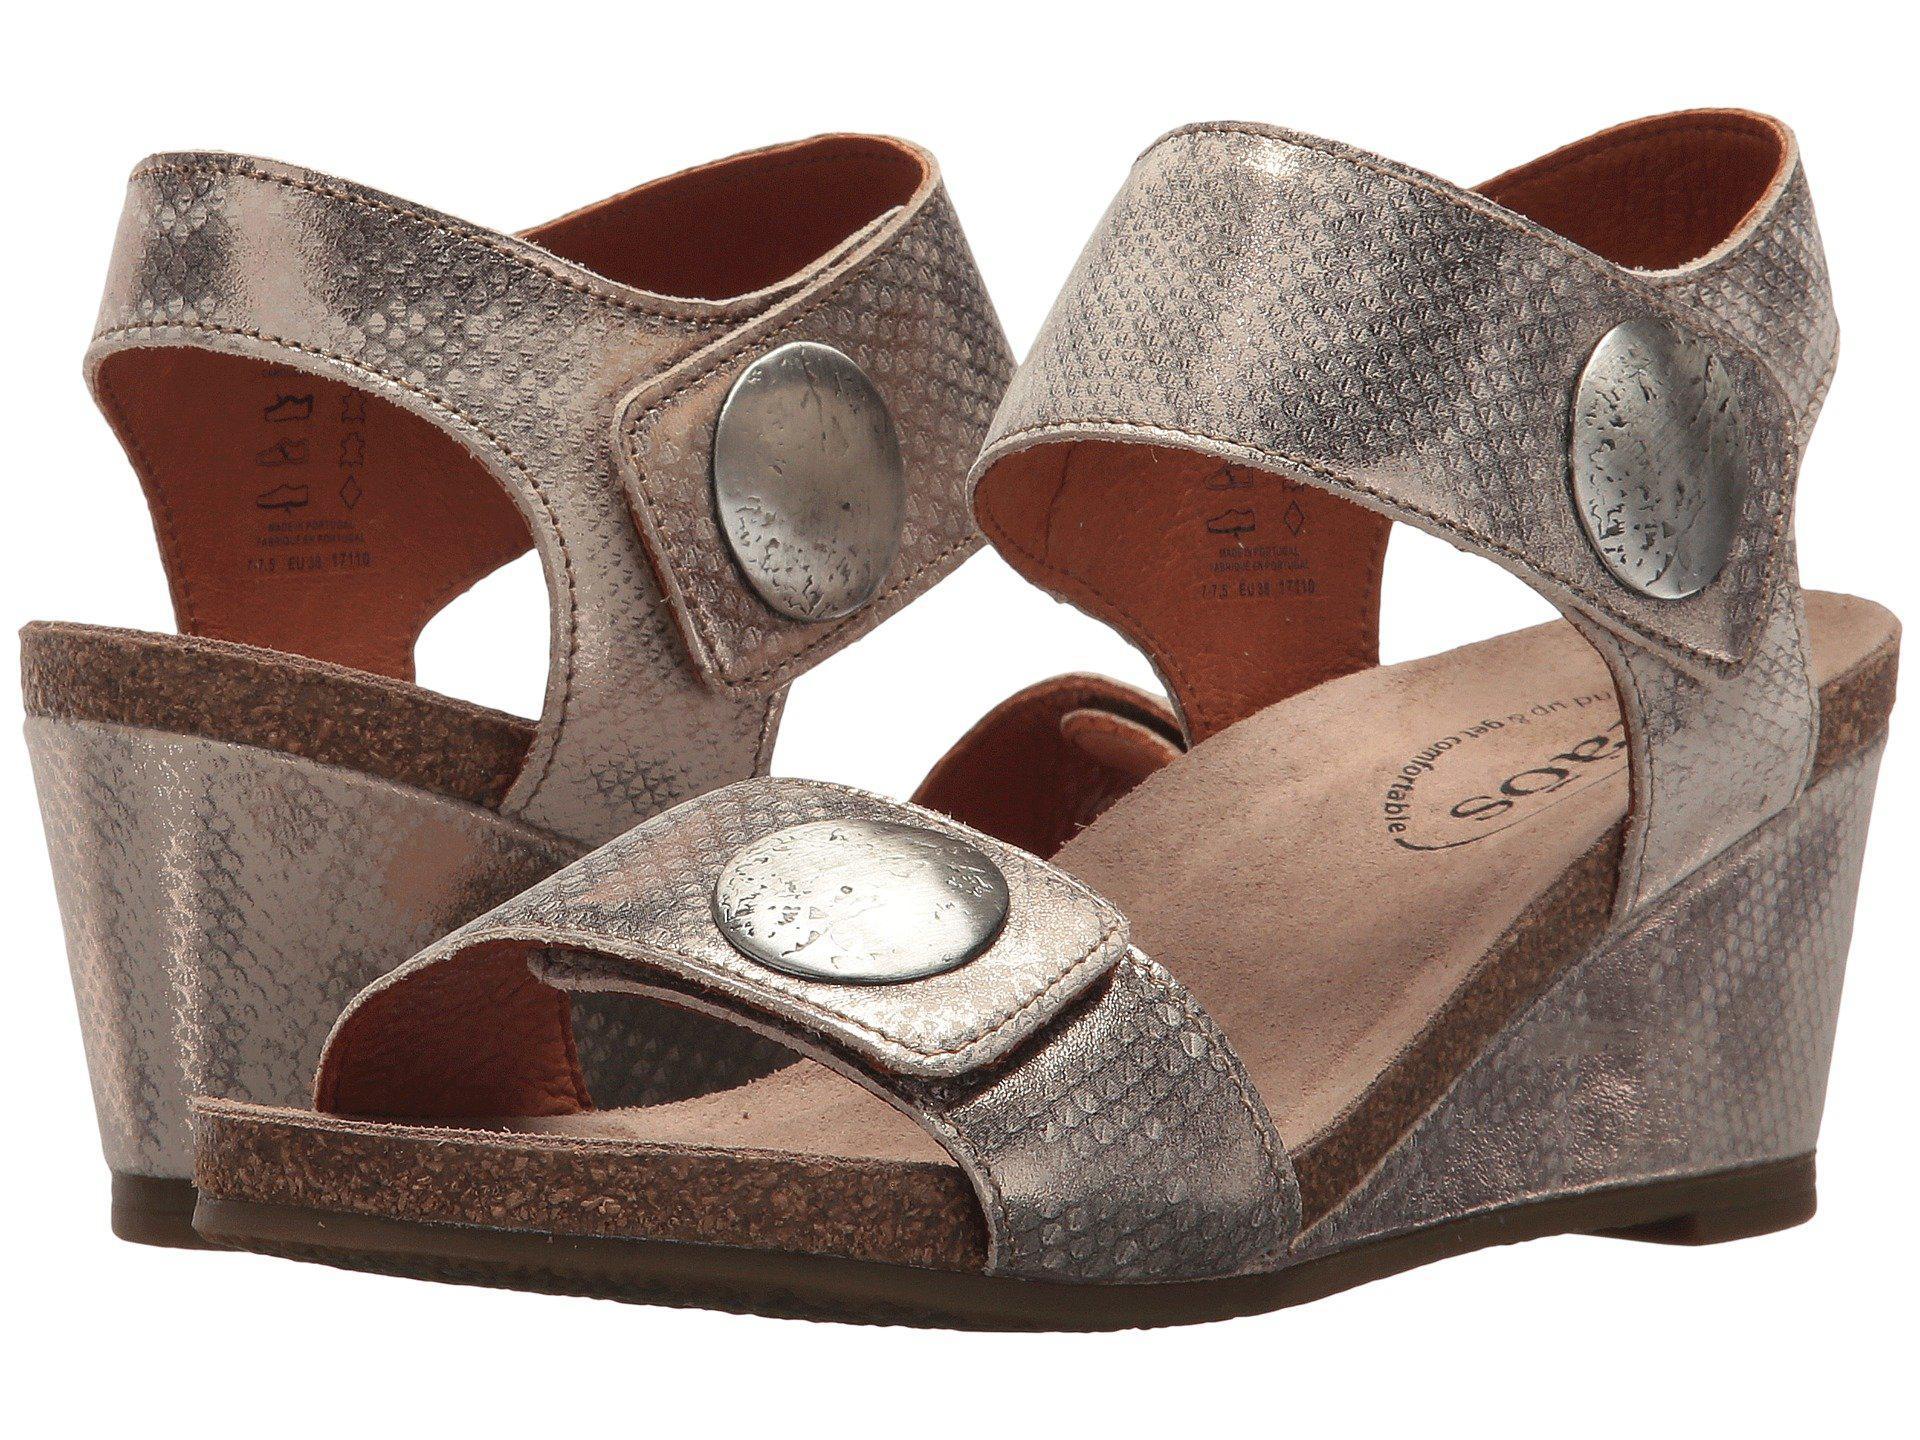 Taos Footwear Carousel 2 Sandals 0wAzMn